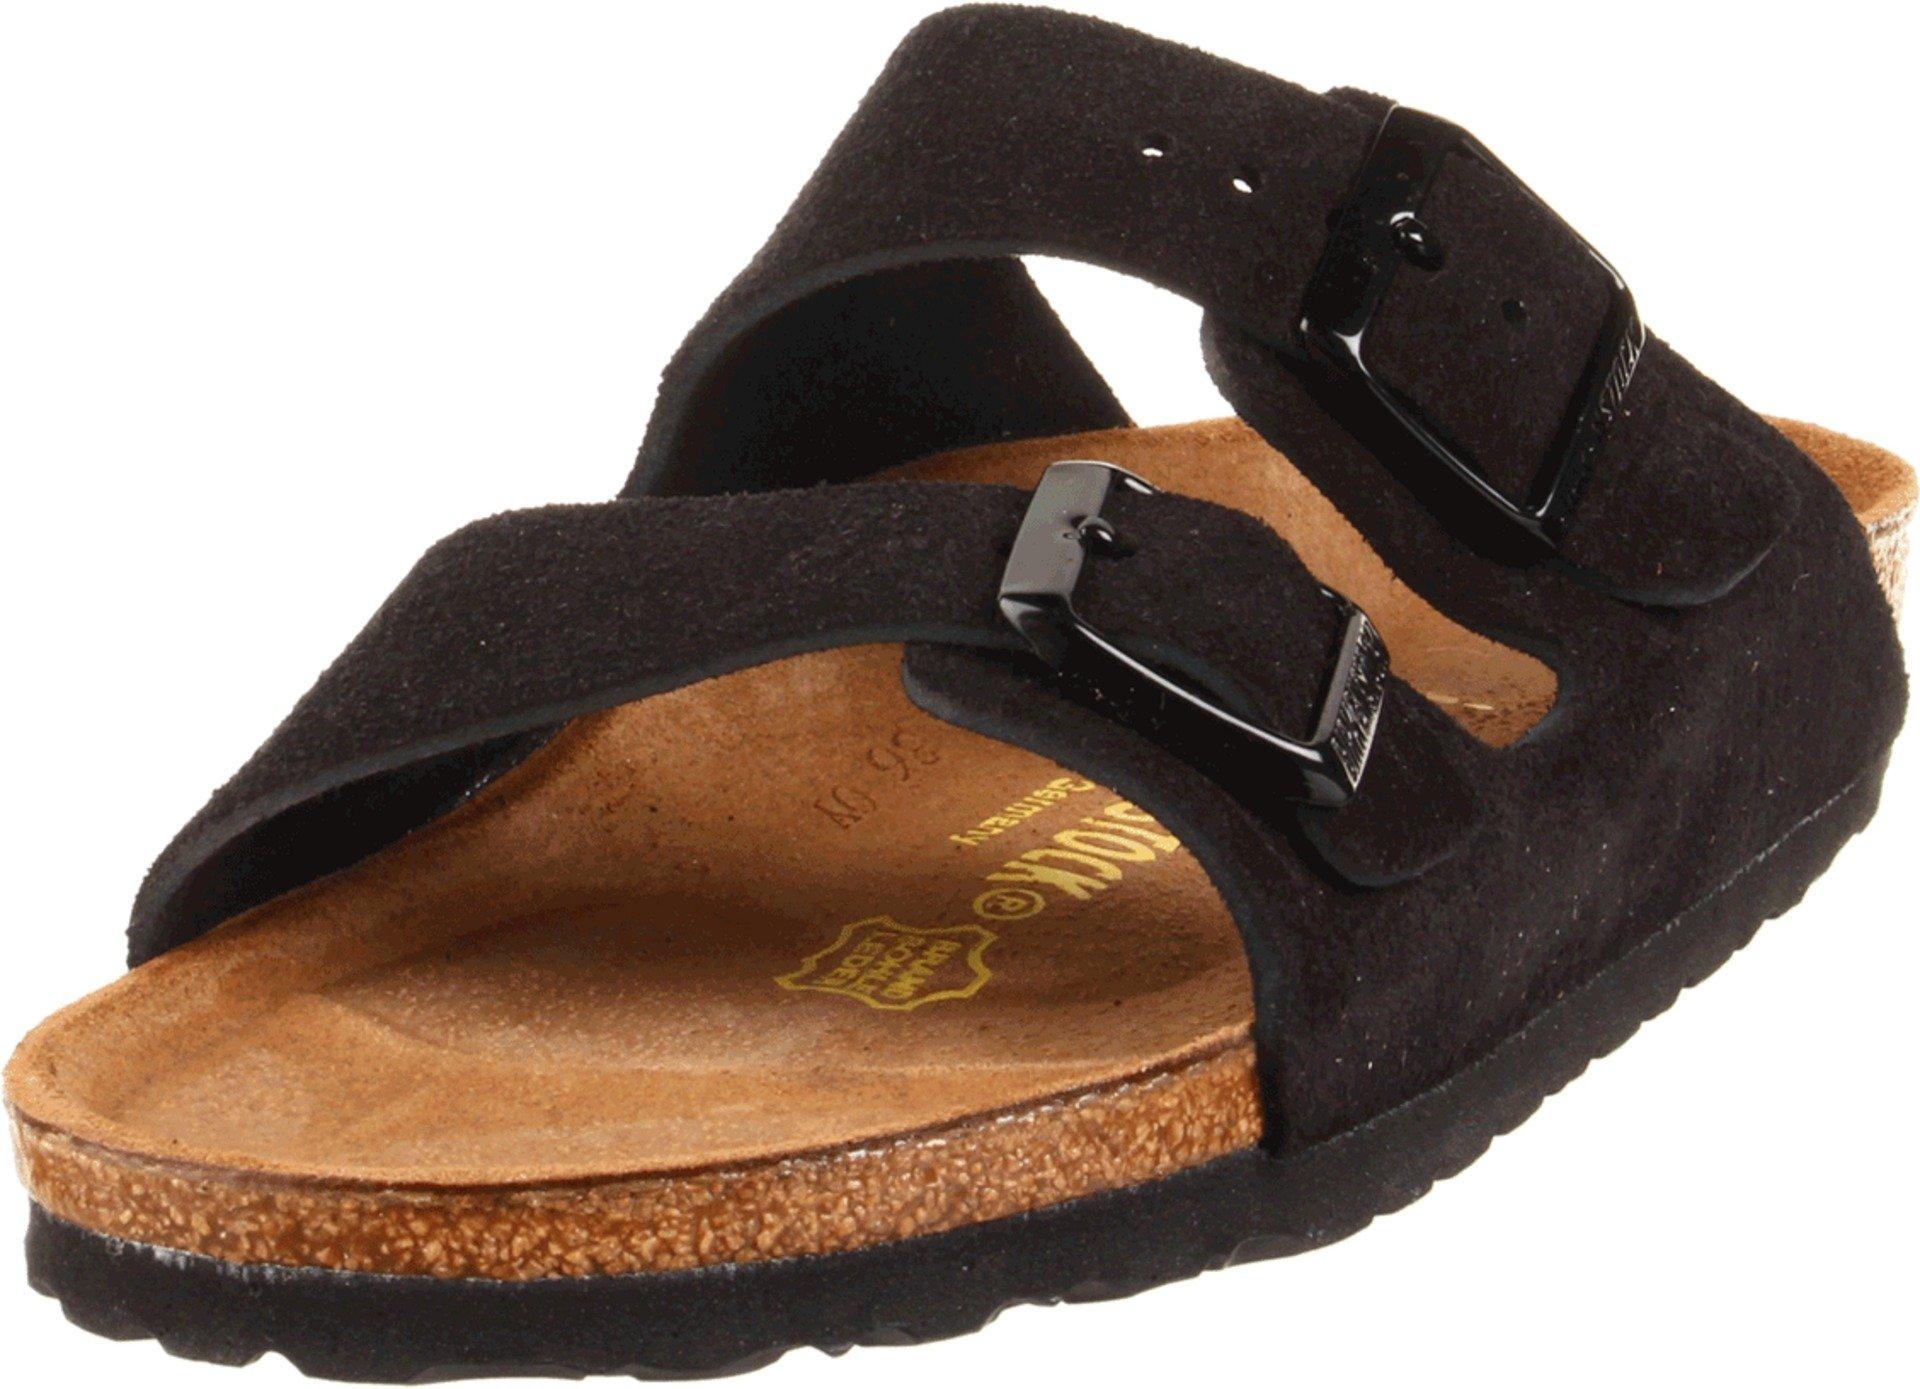 Birkenstock Unisex Arizona Black Suede Sandals - 40 M EU/9-9.5 B(M) US Women/7-7.5 B(M) US Men